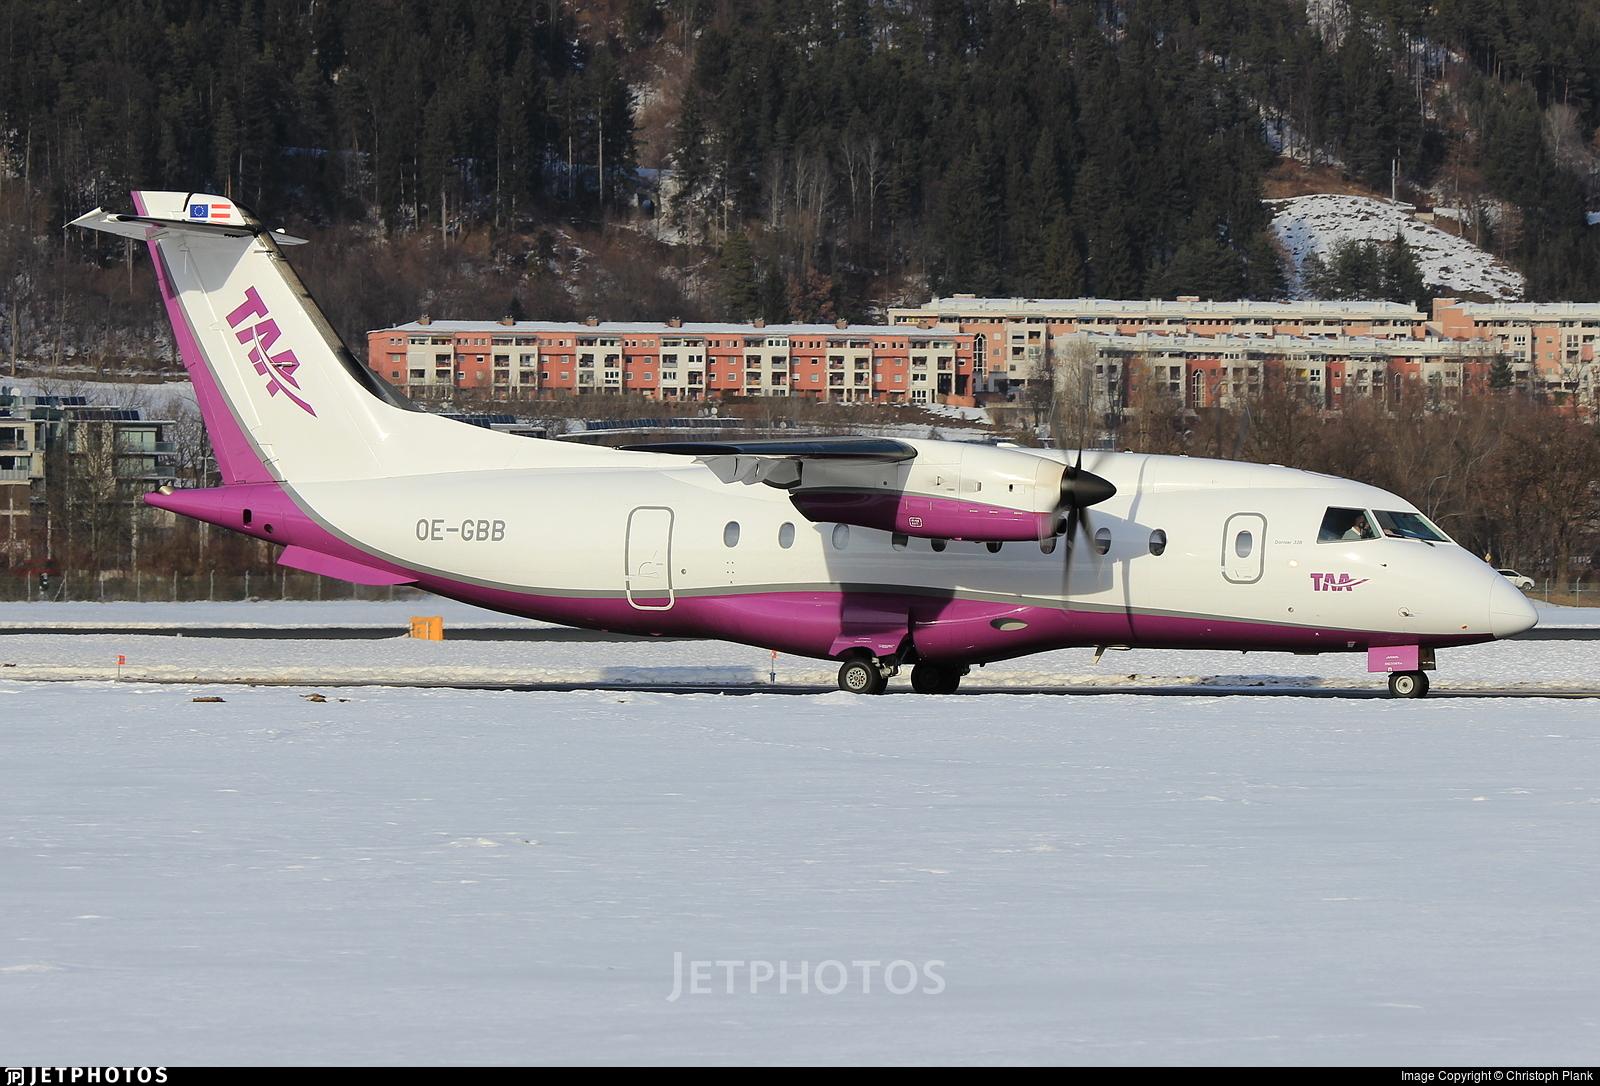 OE-GBB - Dornier Do-328-110 - Tyrol Air Ambulance